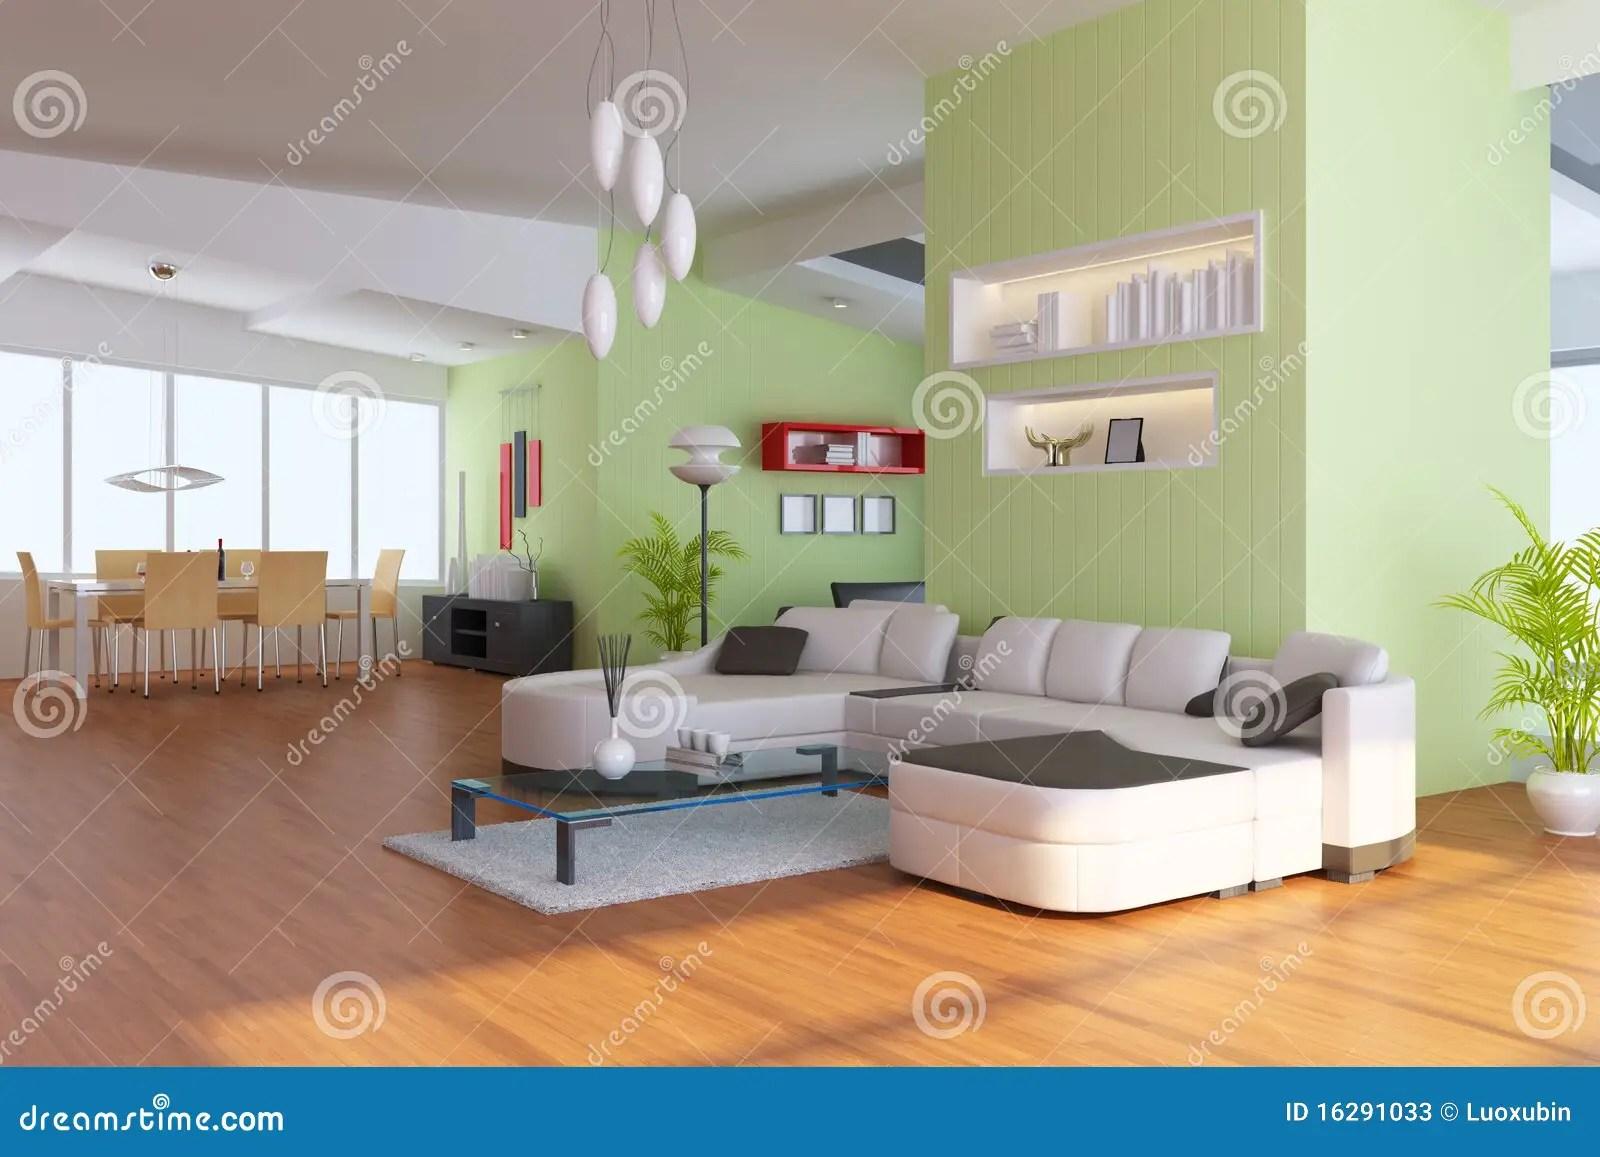 Wohnzimmer Tapeten 2019 Wohnzimmer Tapete Beautiful Tapeten Braun